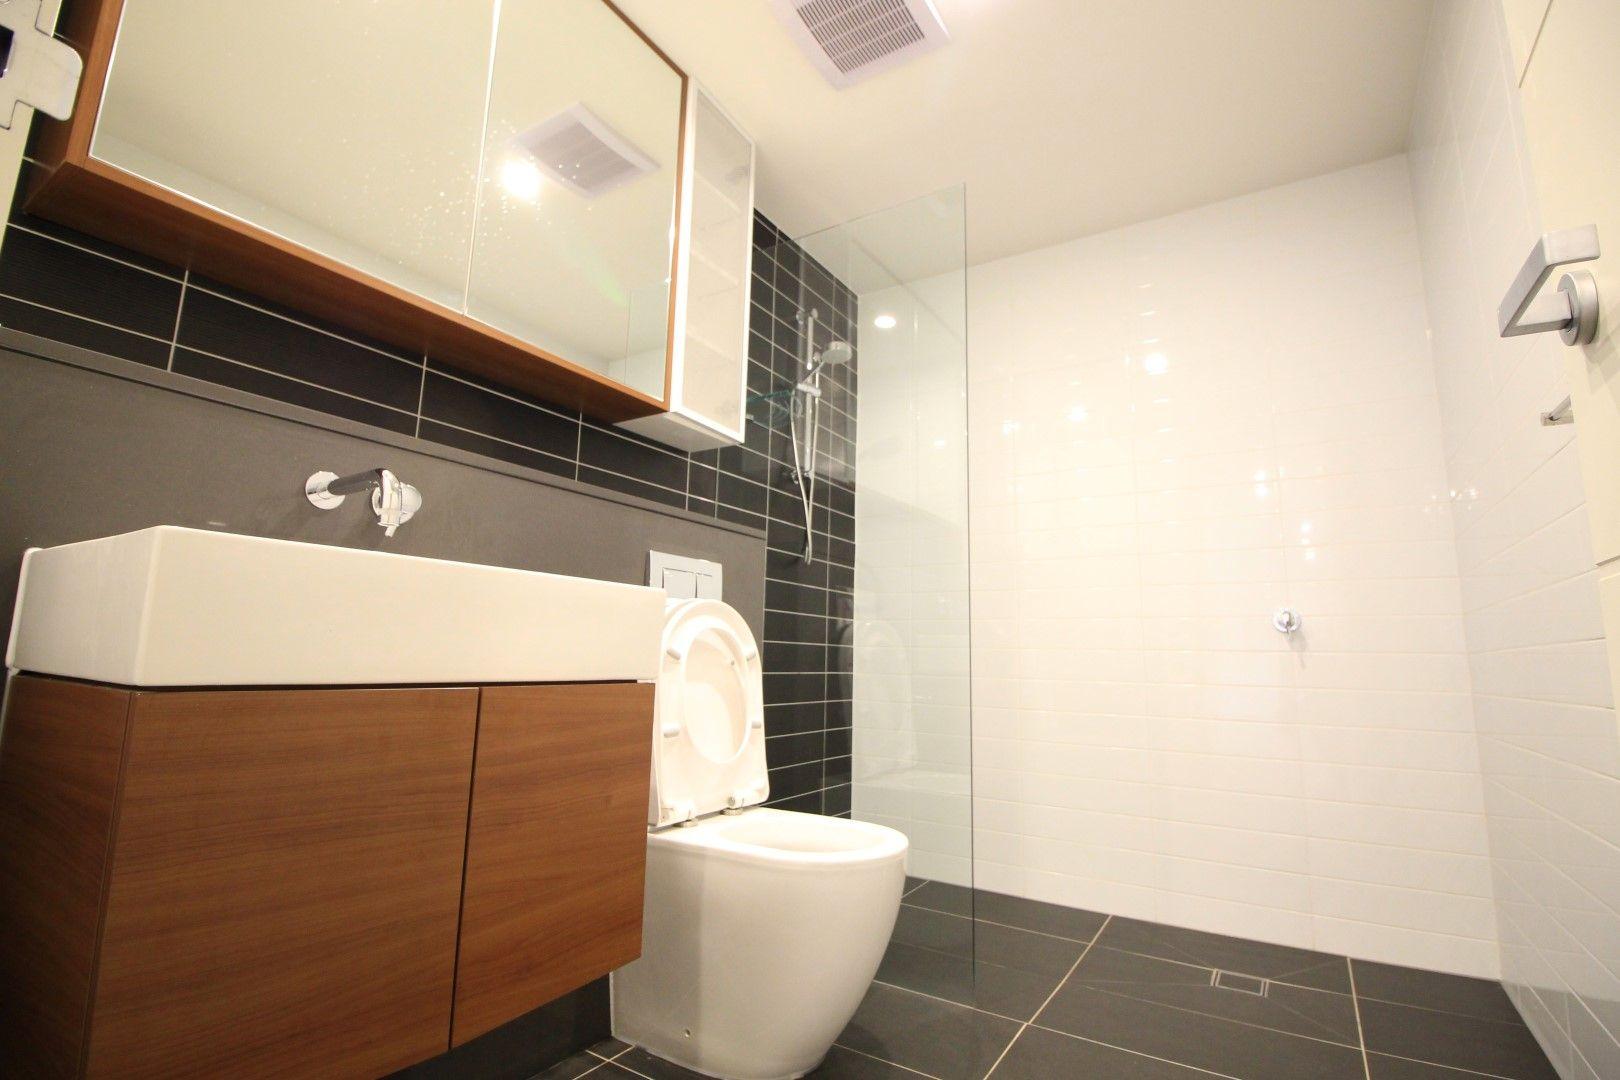 122/24-32 Koorine St, Ermington NSW 2115, Image 2